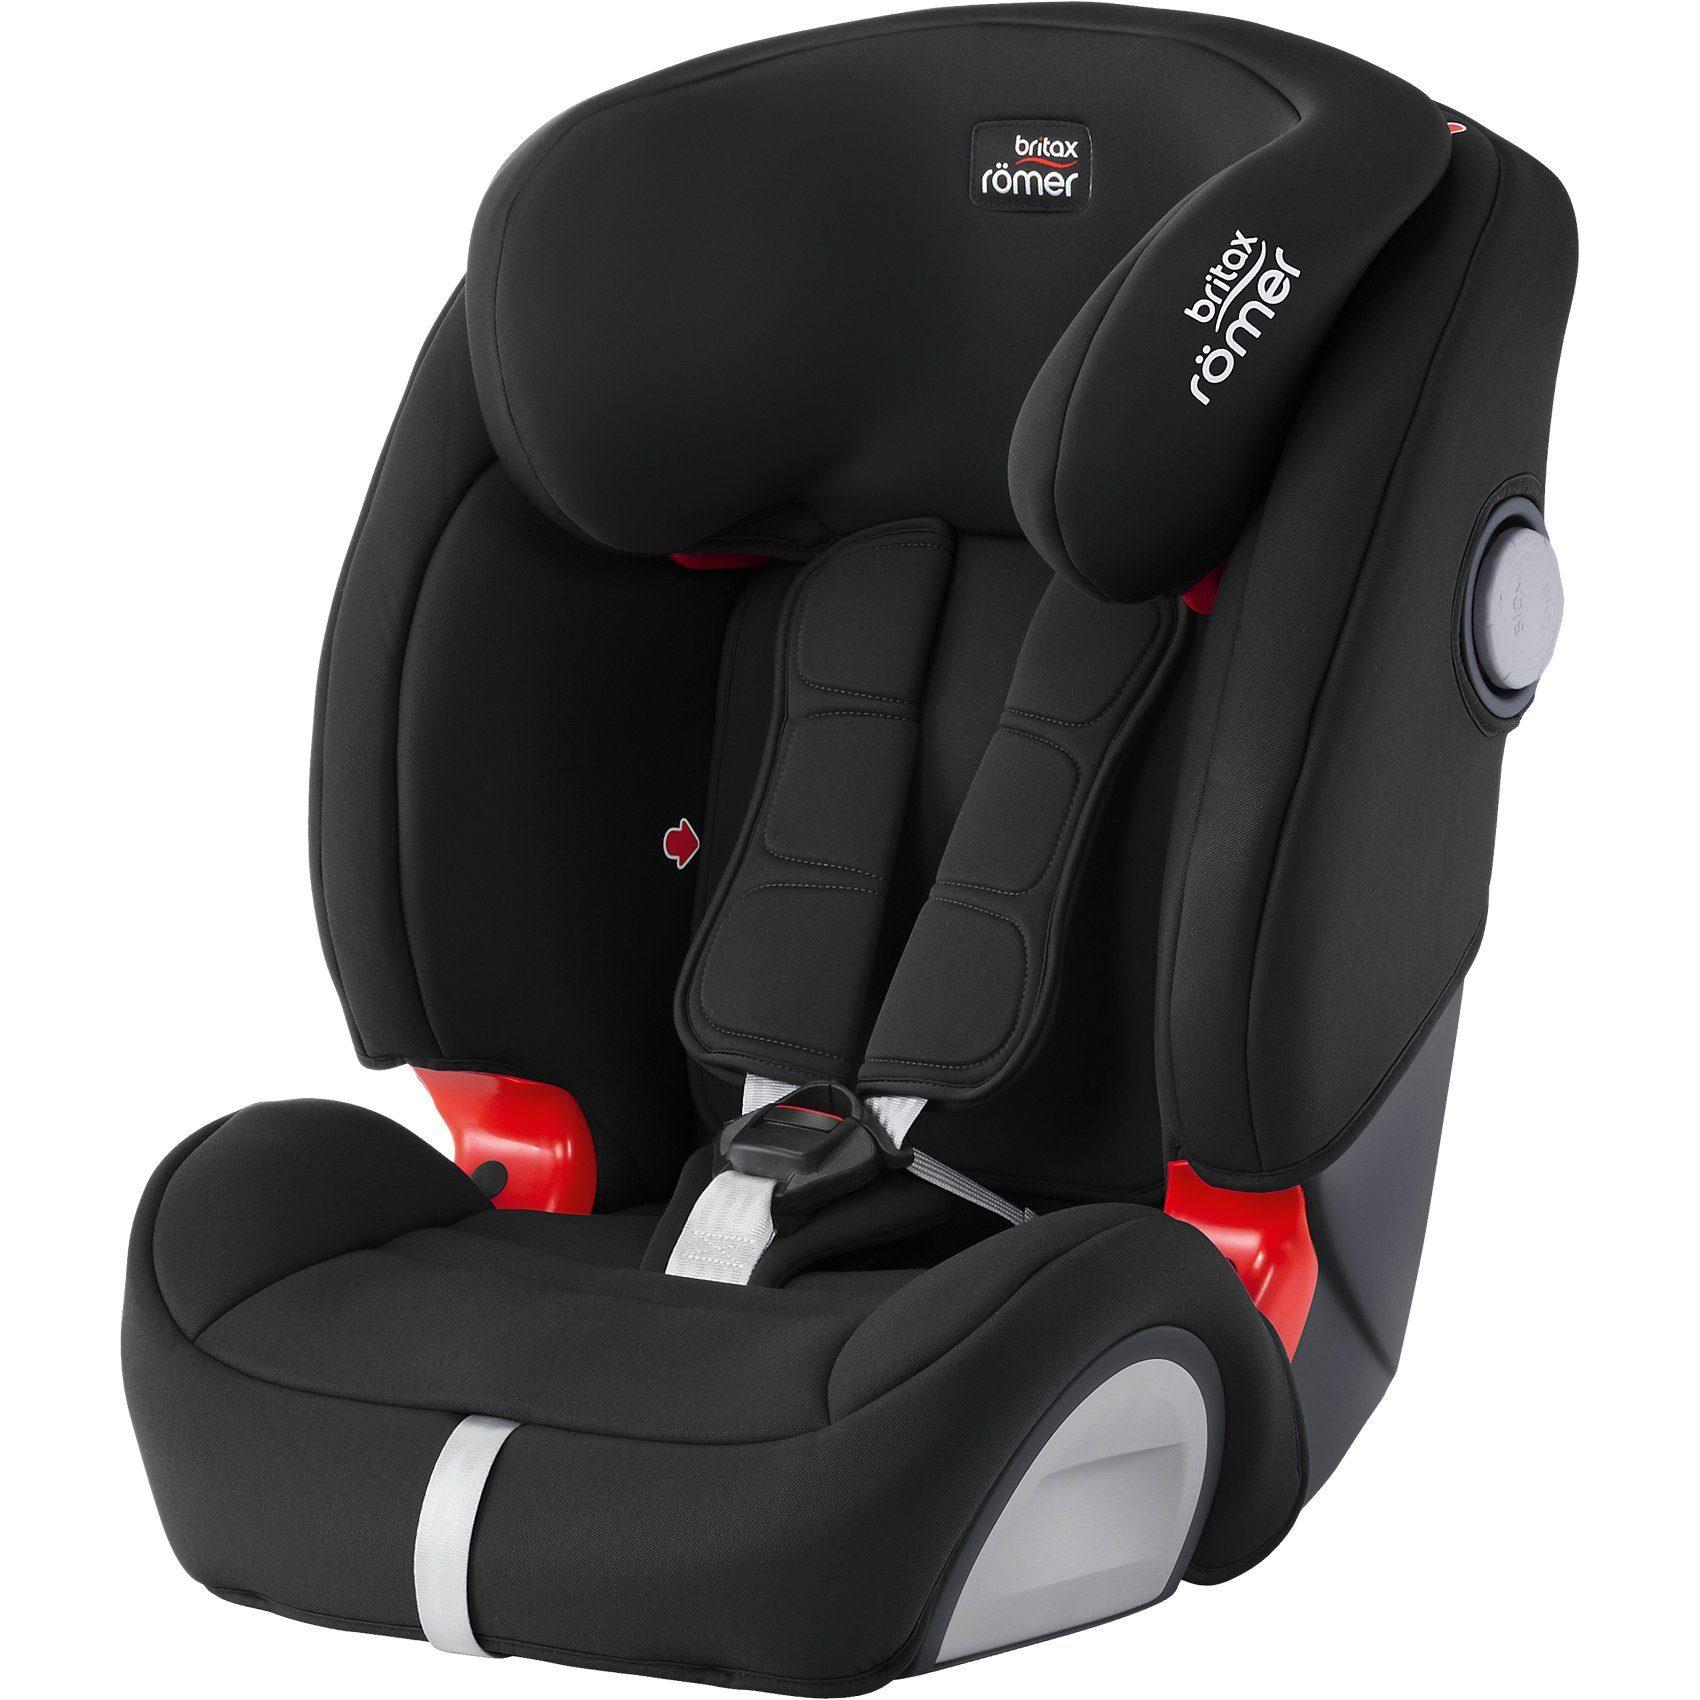 Britax Römer Auto-Kindersitz Evolva 1-2-3 SL SICT, Cosmos Black, 2017